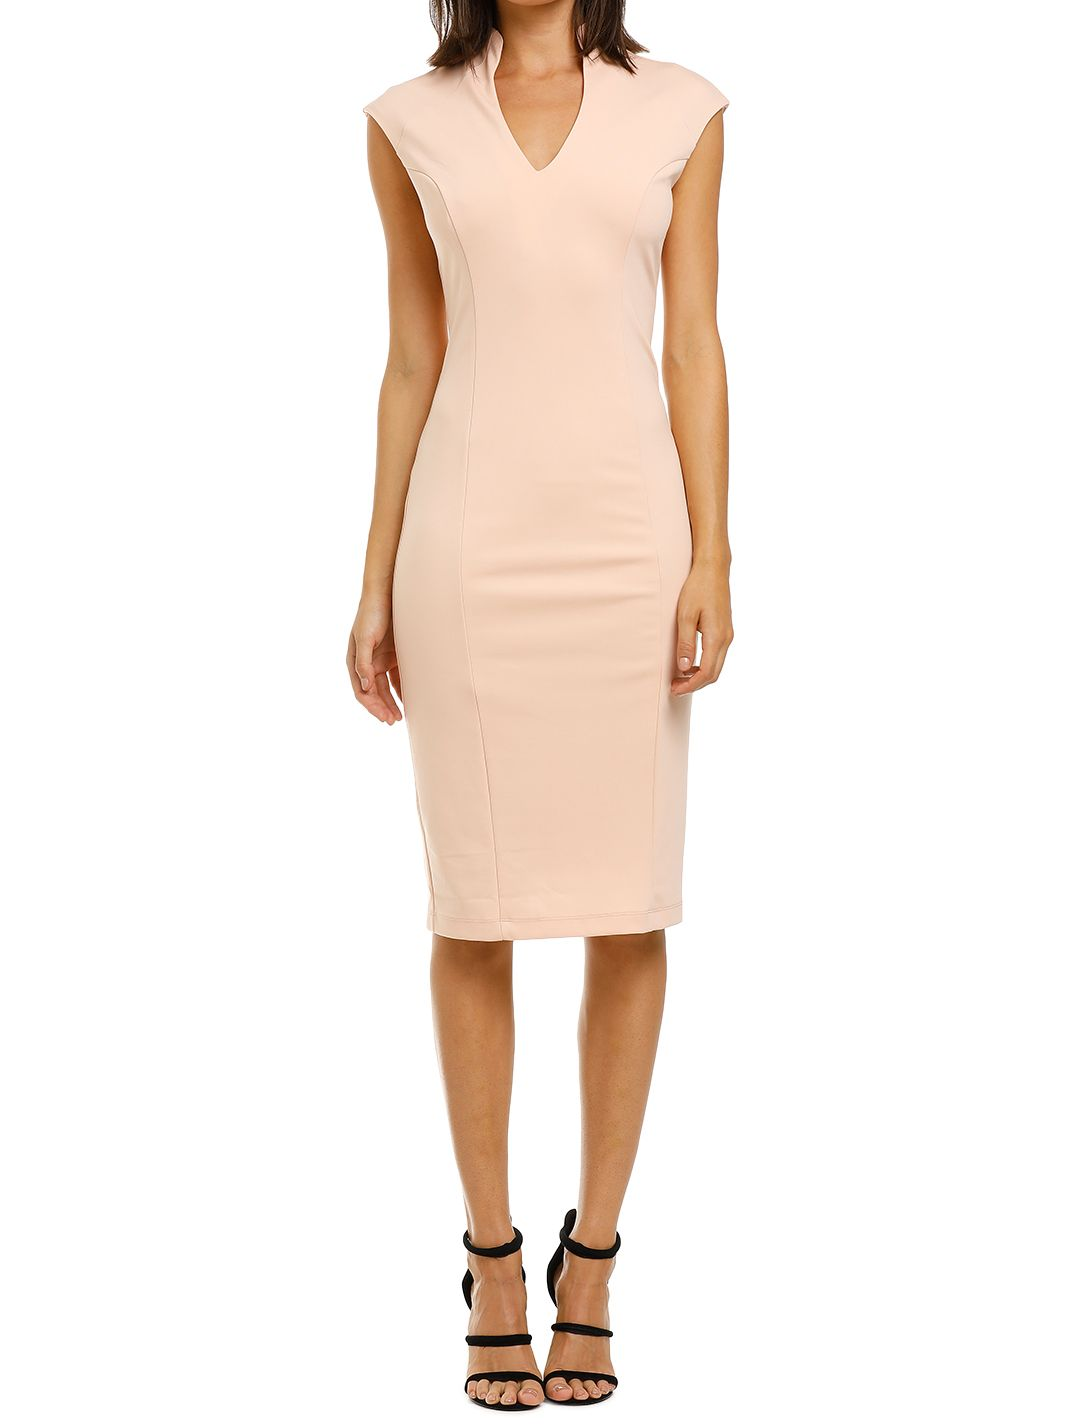 Alexia-Admor-Katrina-V-Neck-Midi-Dress-Blush-Front